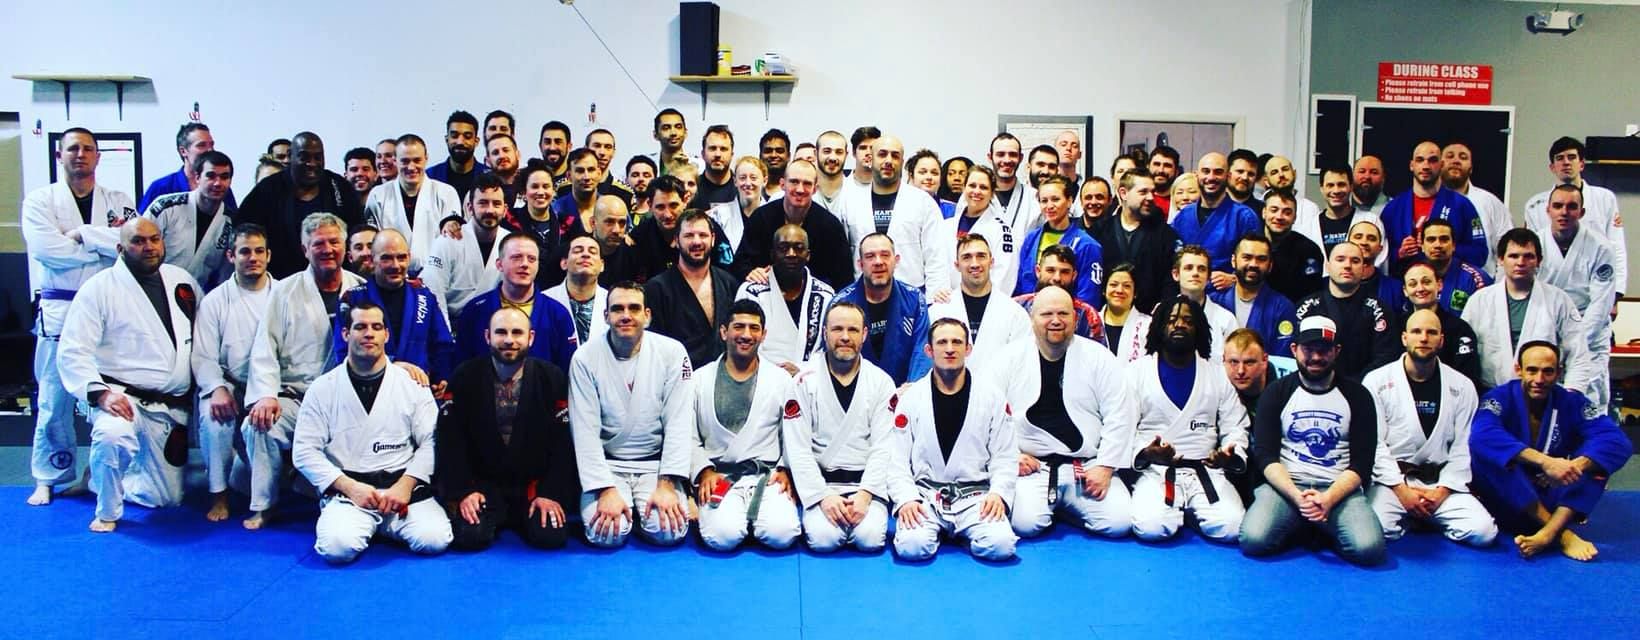 Conshohocken Martial Arts , Plymouth Meeting MMA , Jiu Jitsu near me